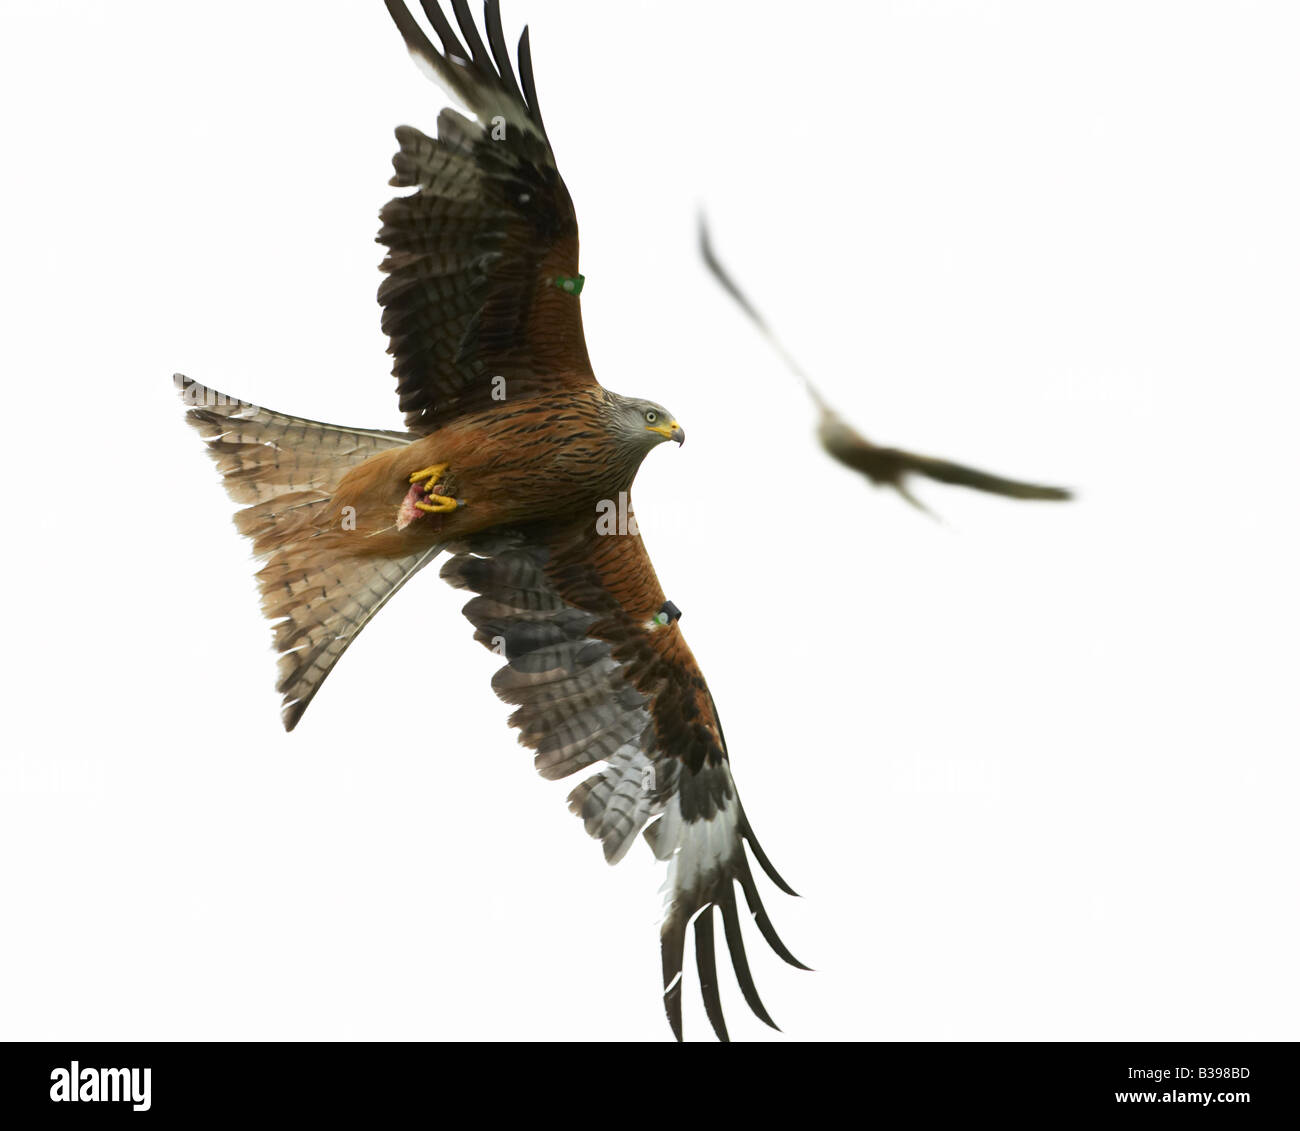 Red kites in flight - Stock Image